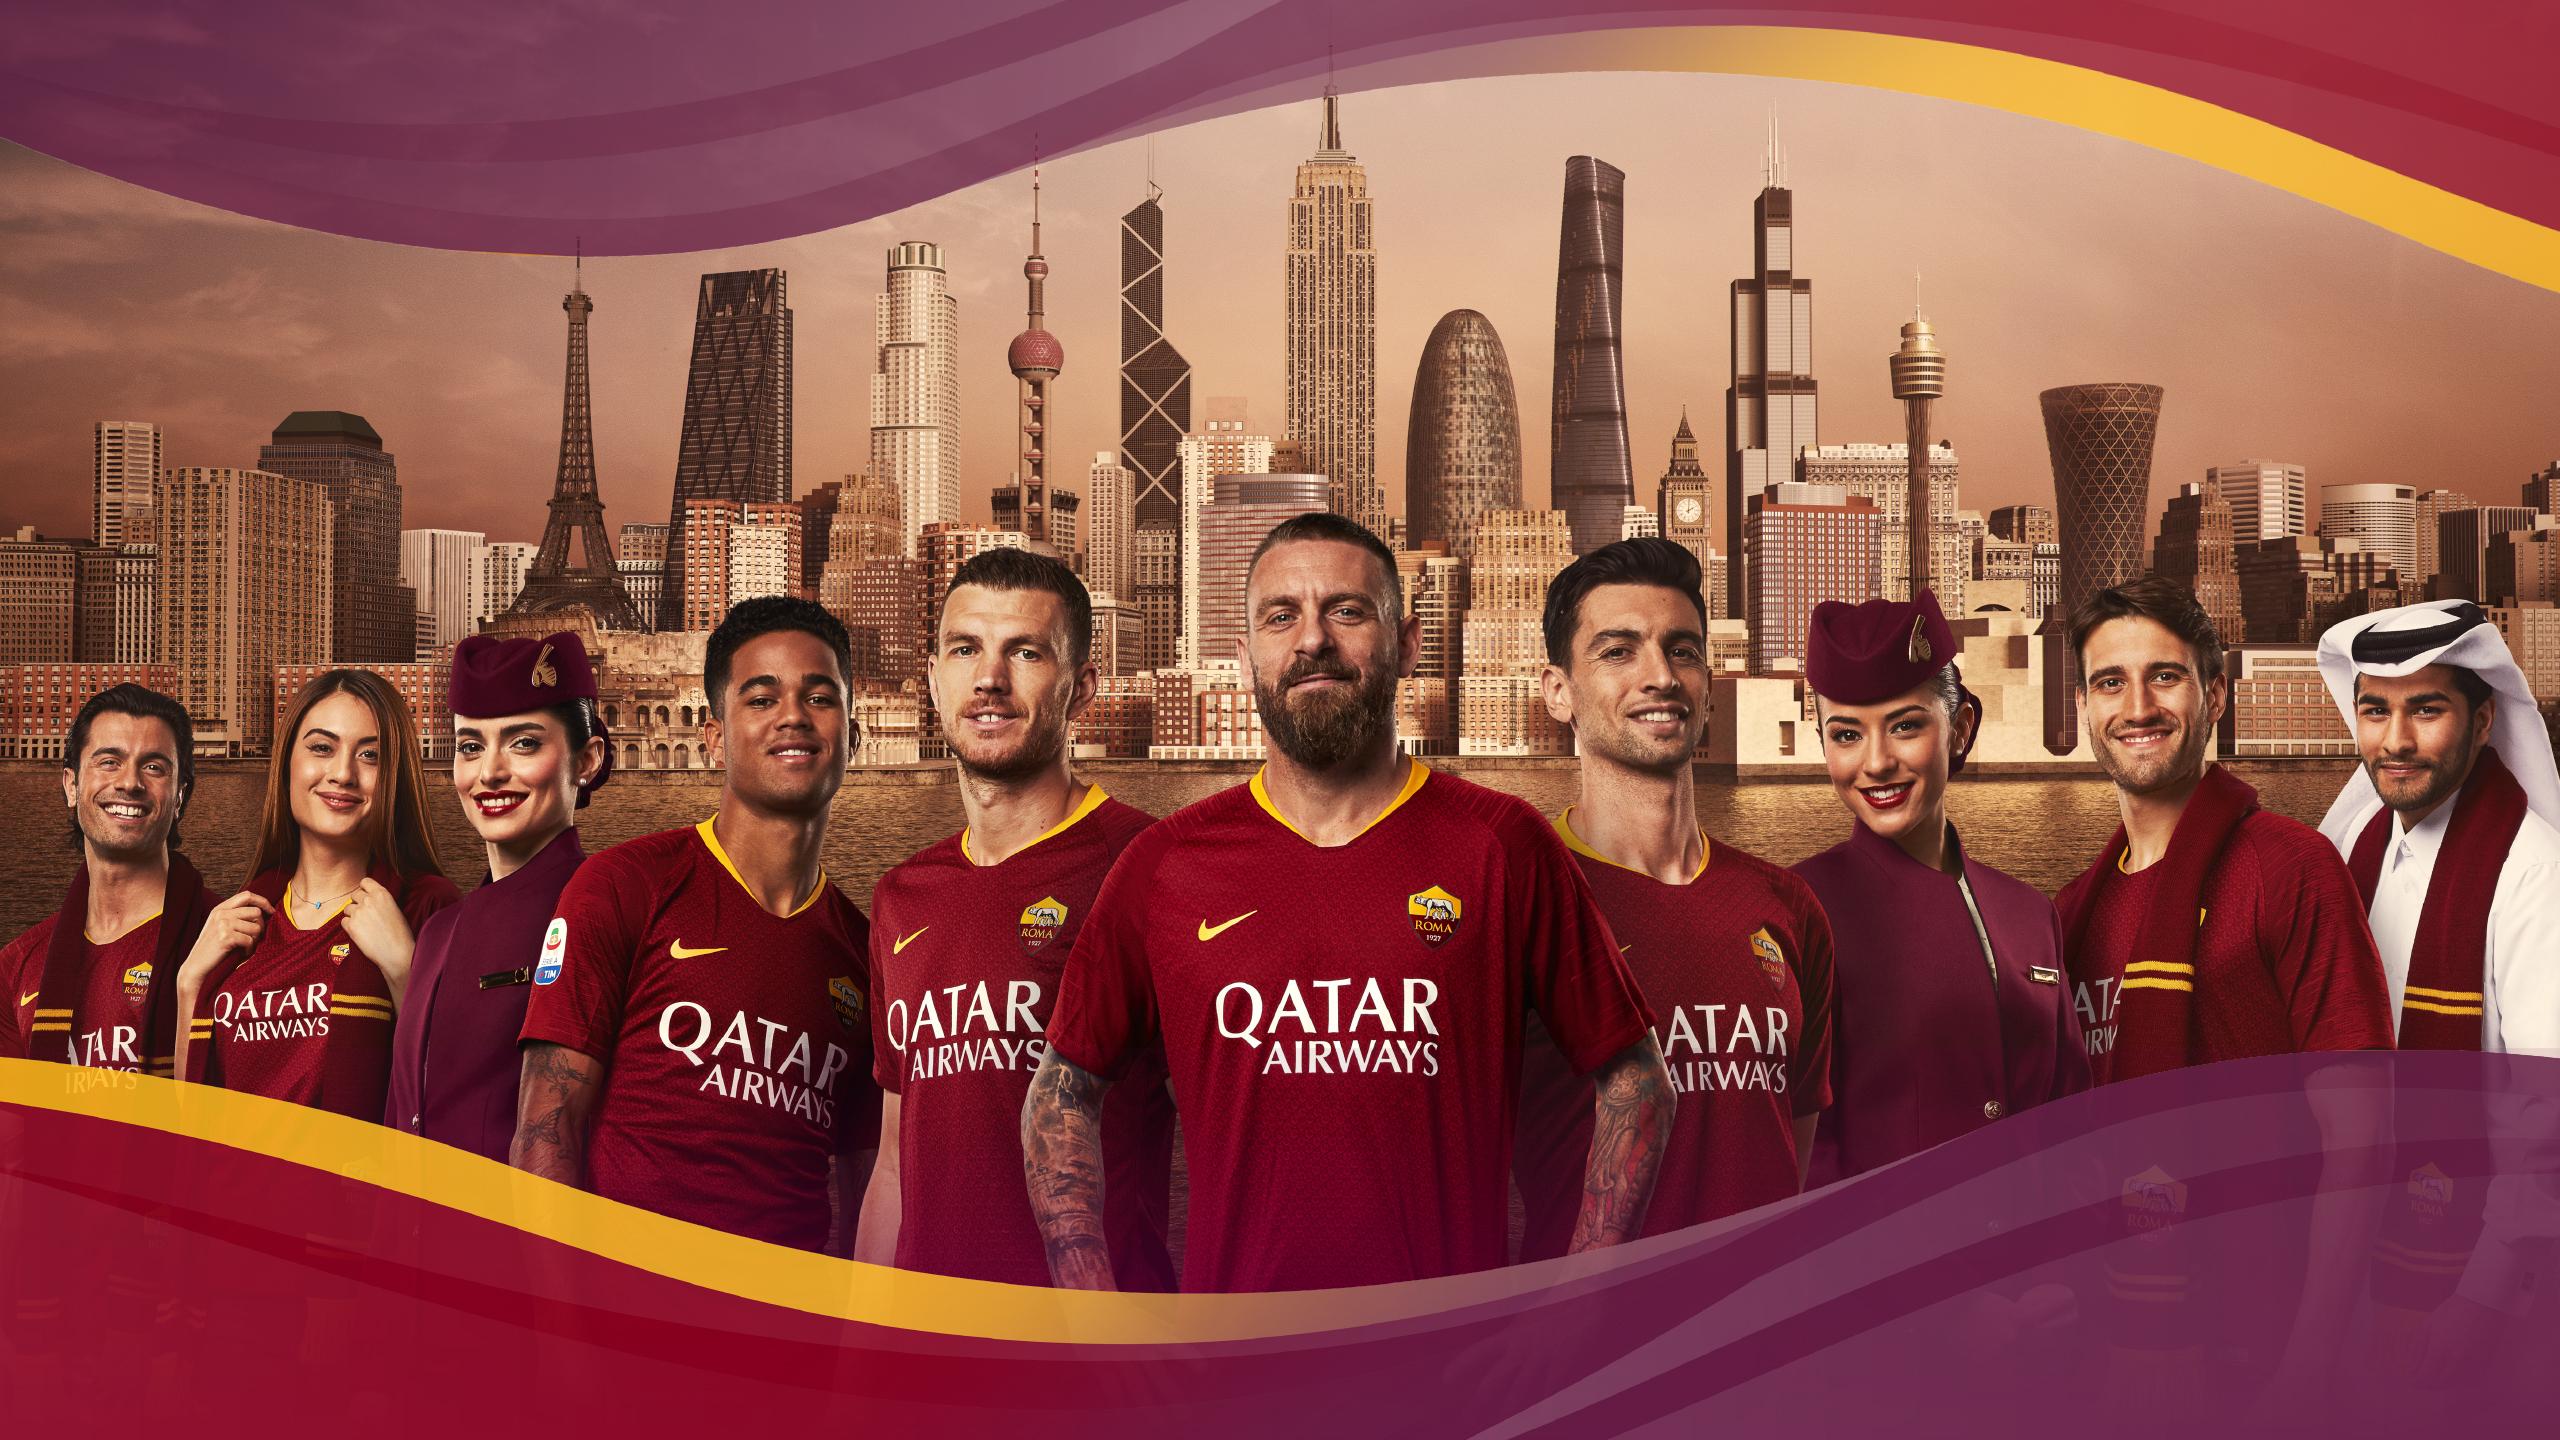 Qatar Airways <br> All Together Roma